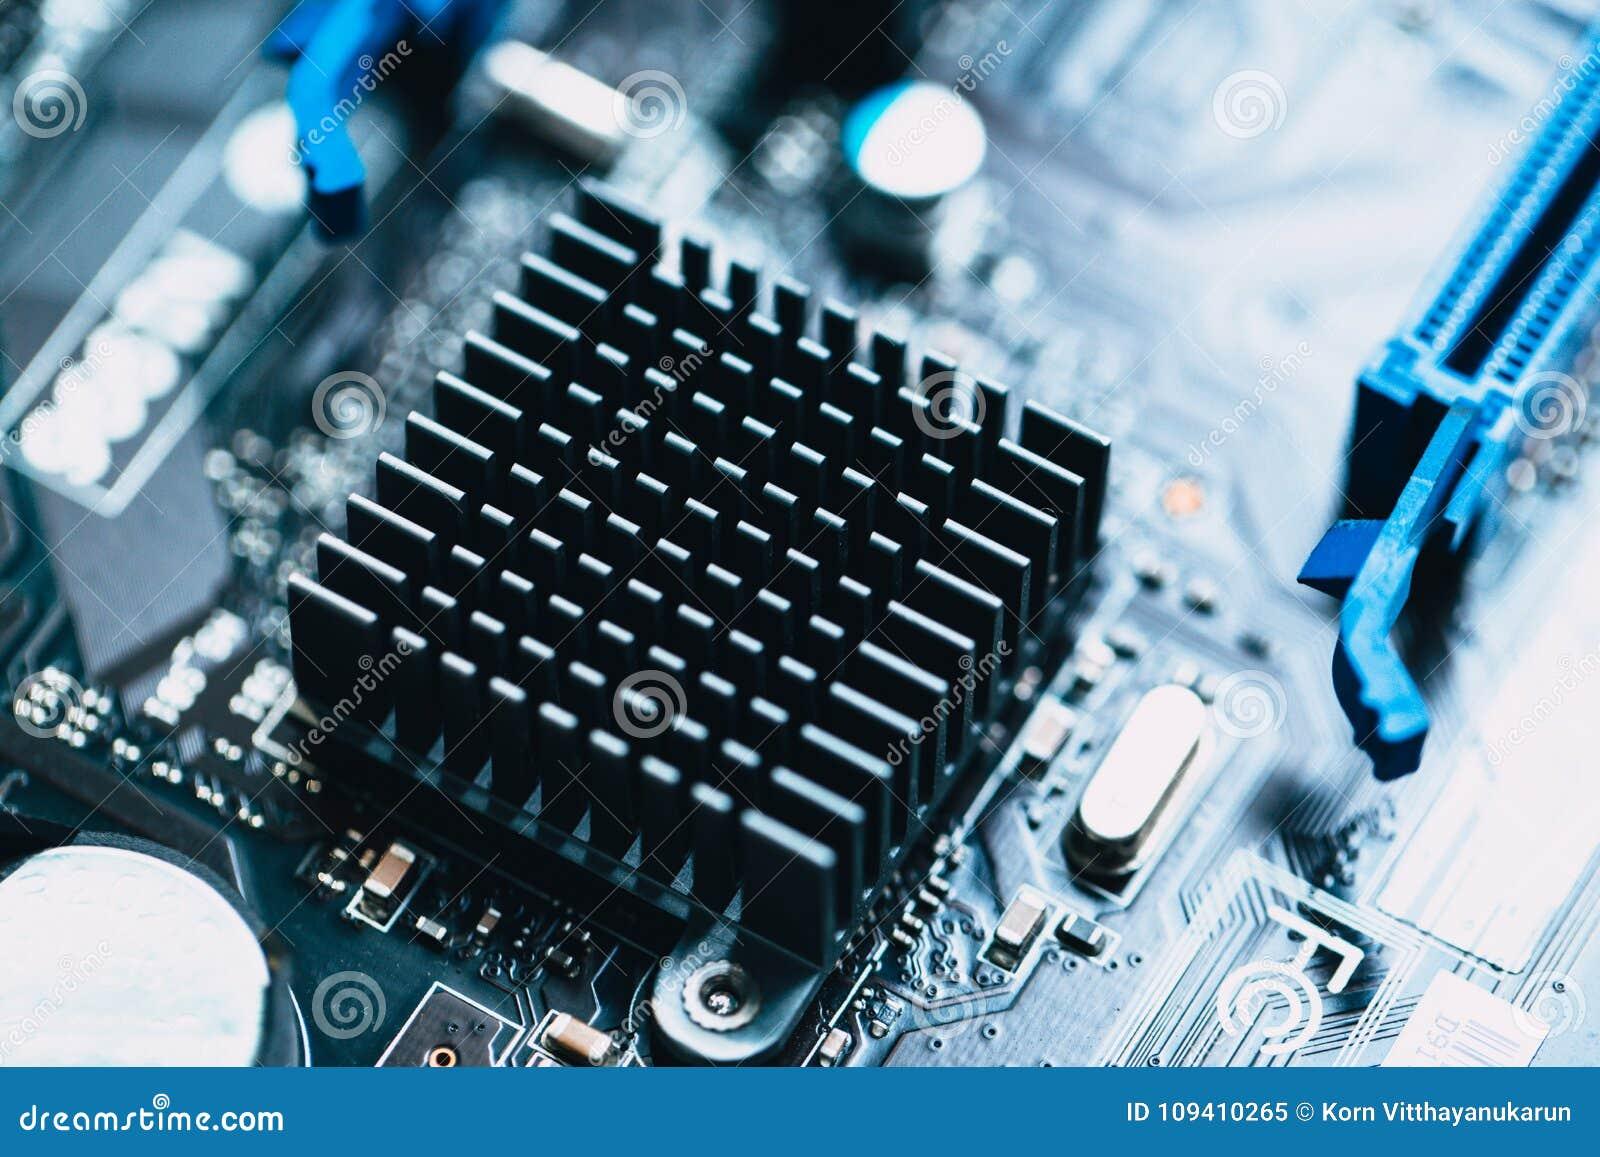 aluminum heat sink install at computer circuit board stock image rh dreamstime com